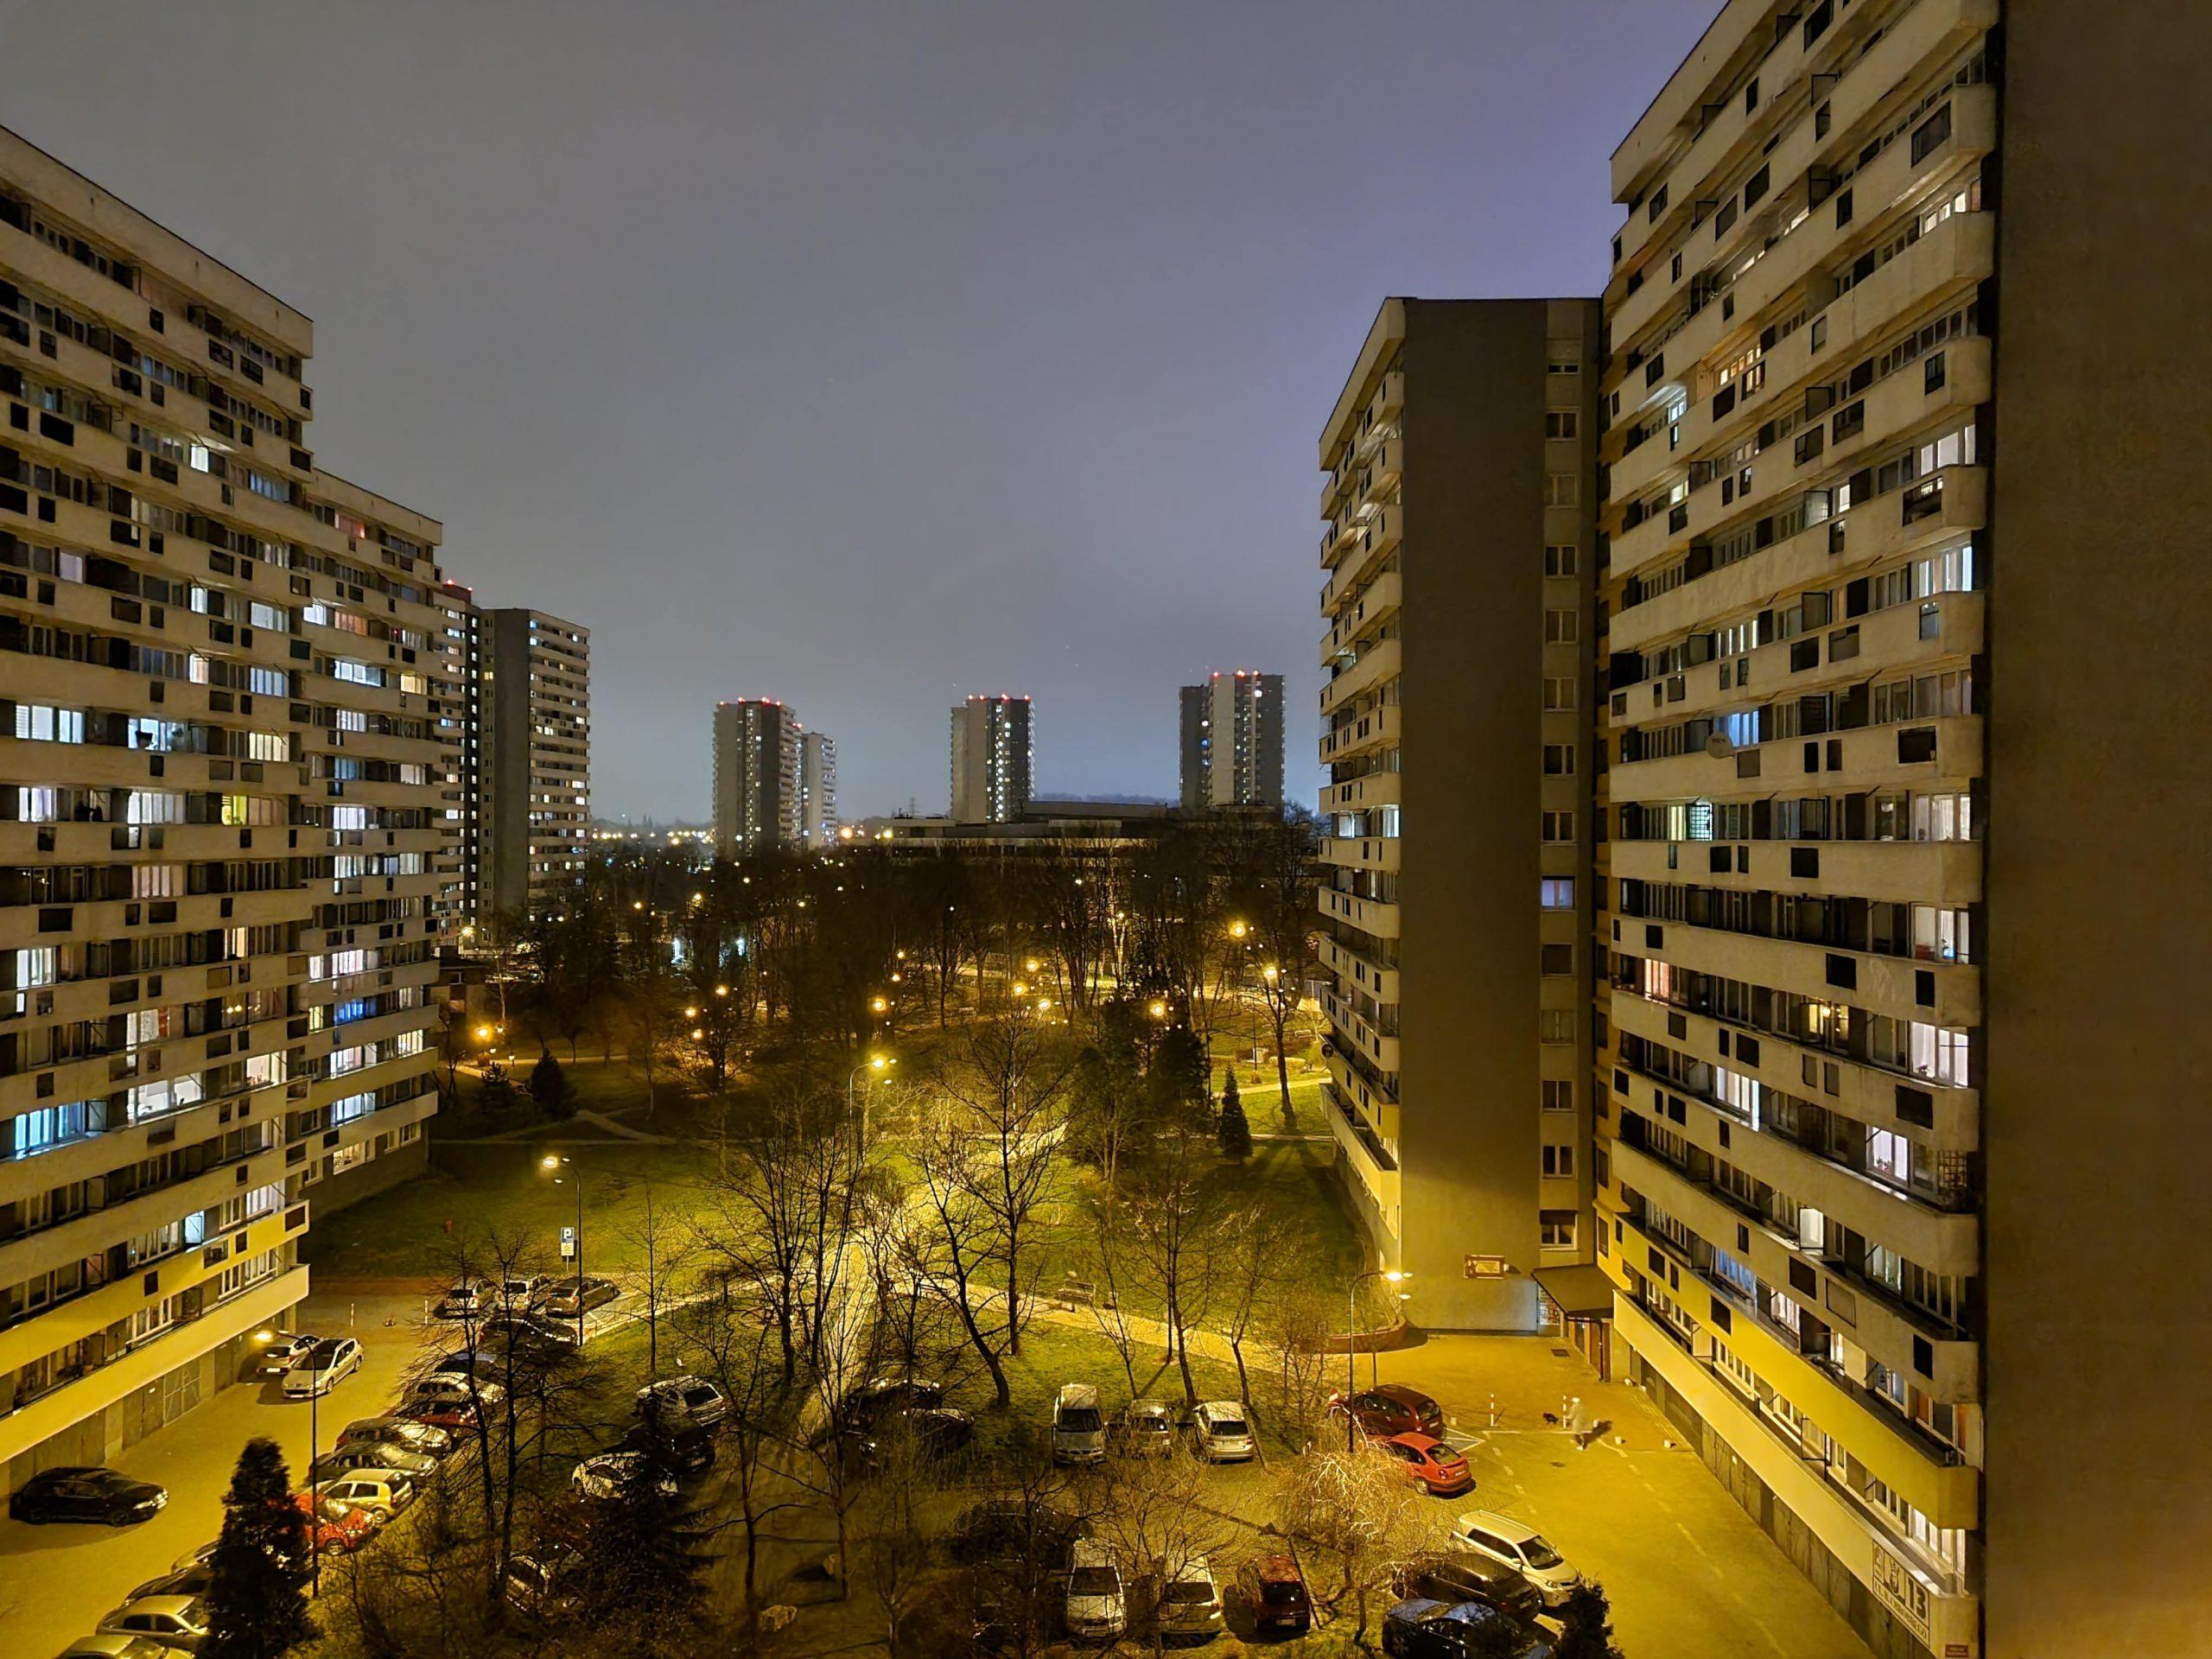 Zdjęcia nocne - Samsung Galaxy S21